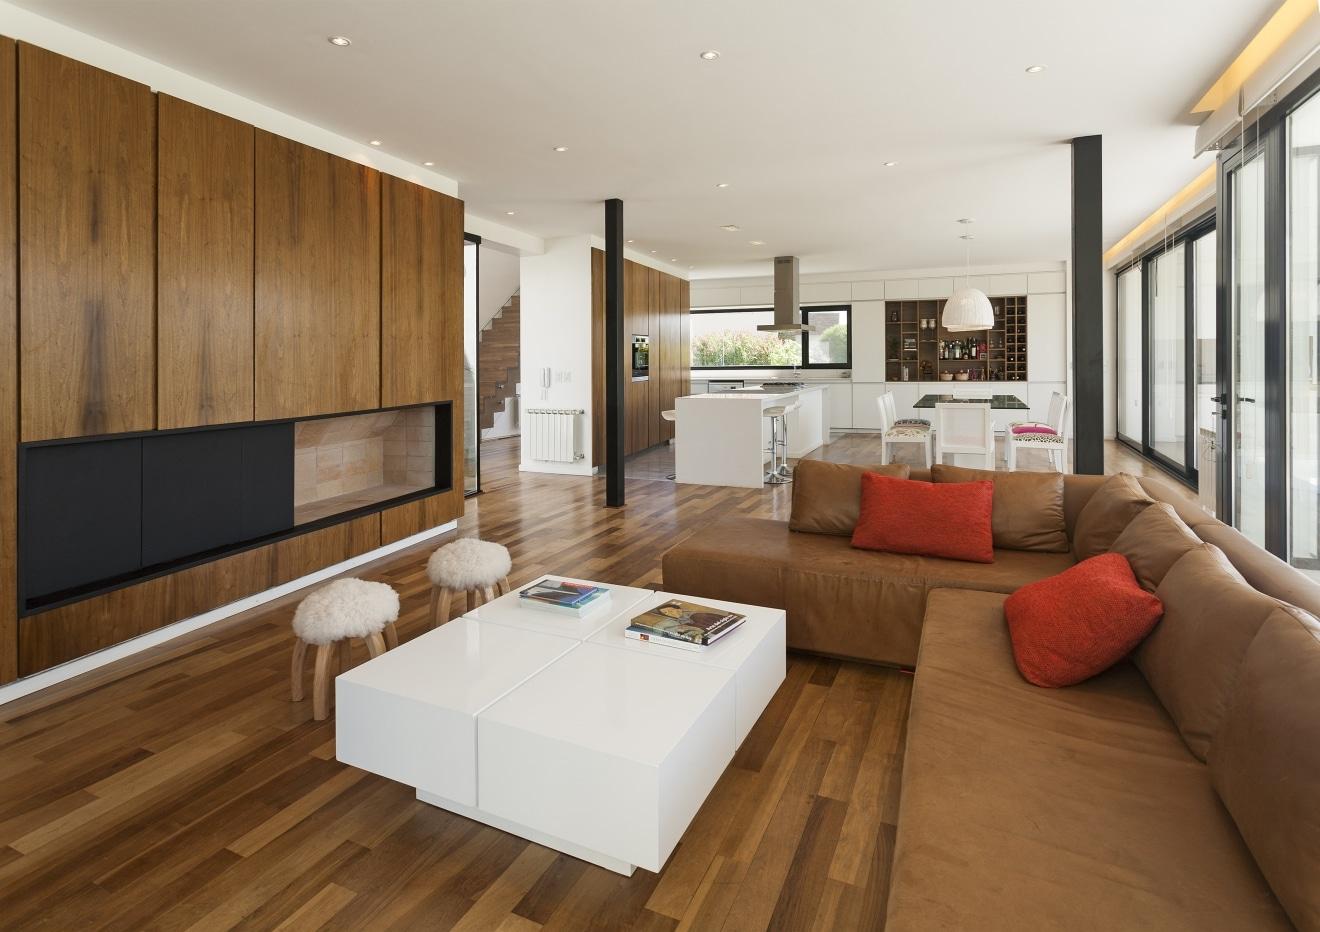 Sala comedor peque os planos design casa creativa e for Diseno de paredes para salas